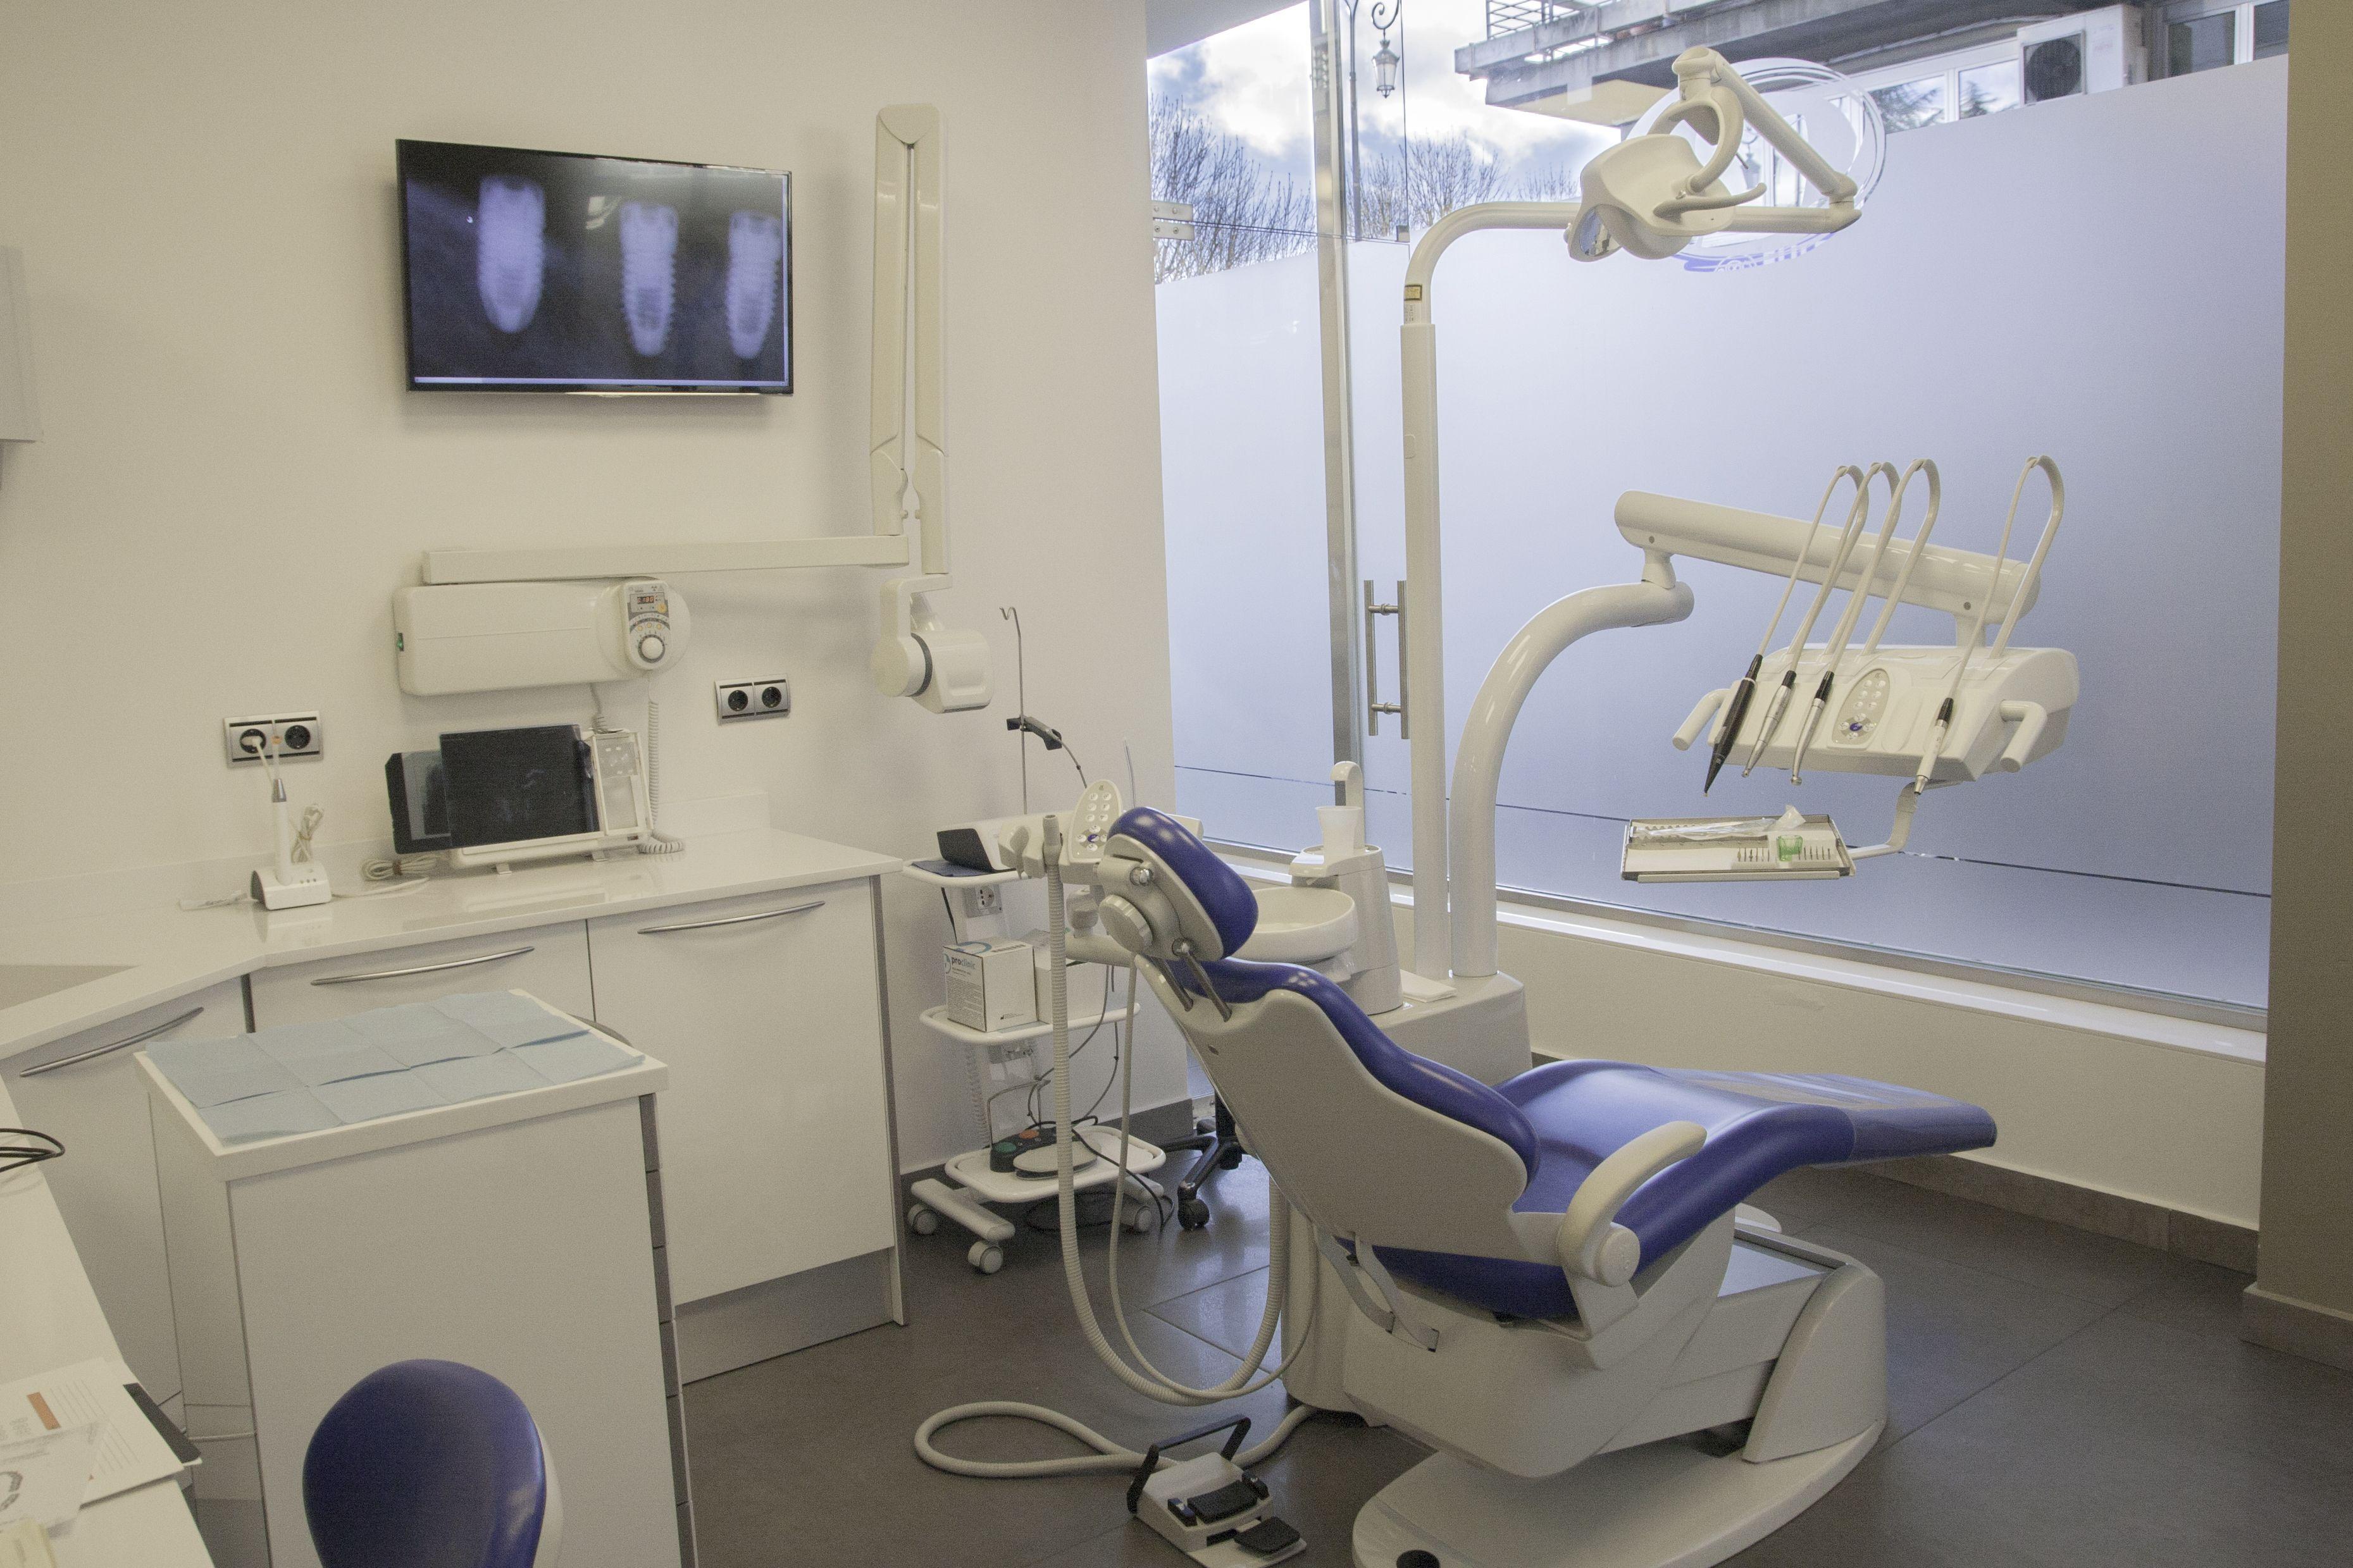 Foto 6 de Clínicas dentales en León | Clínica Dental Censadent